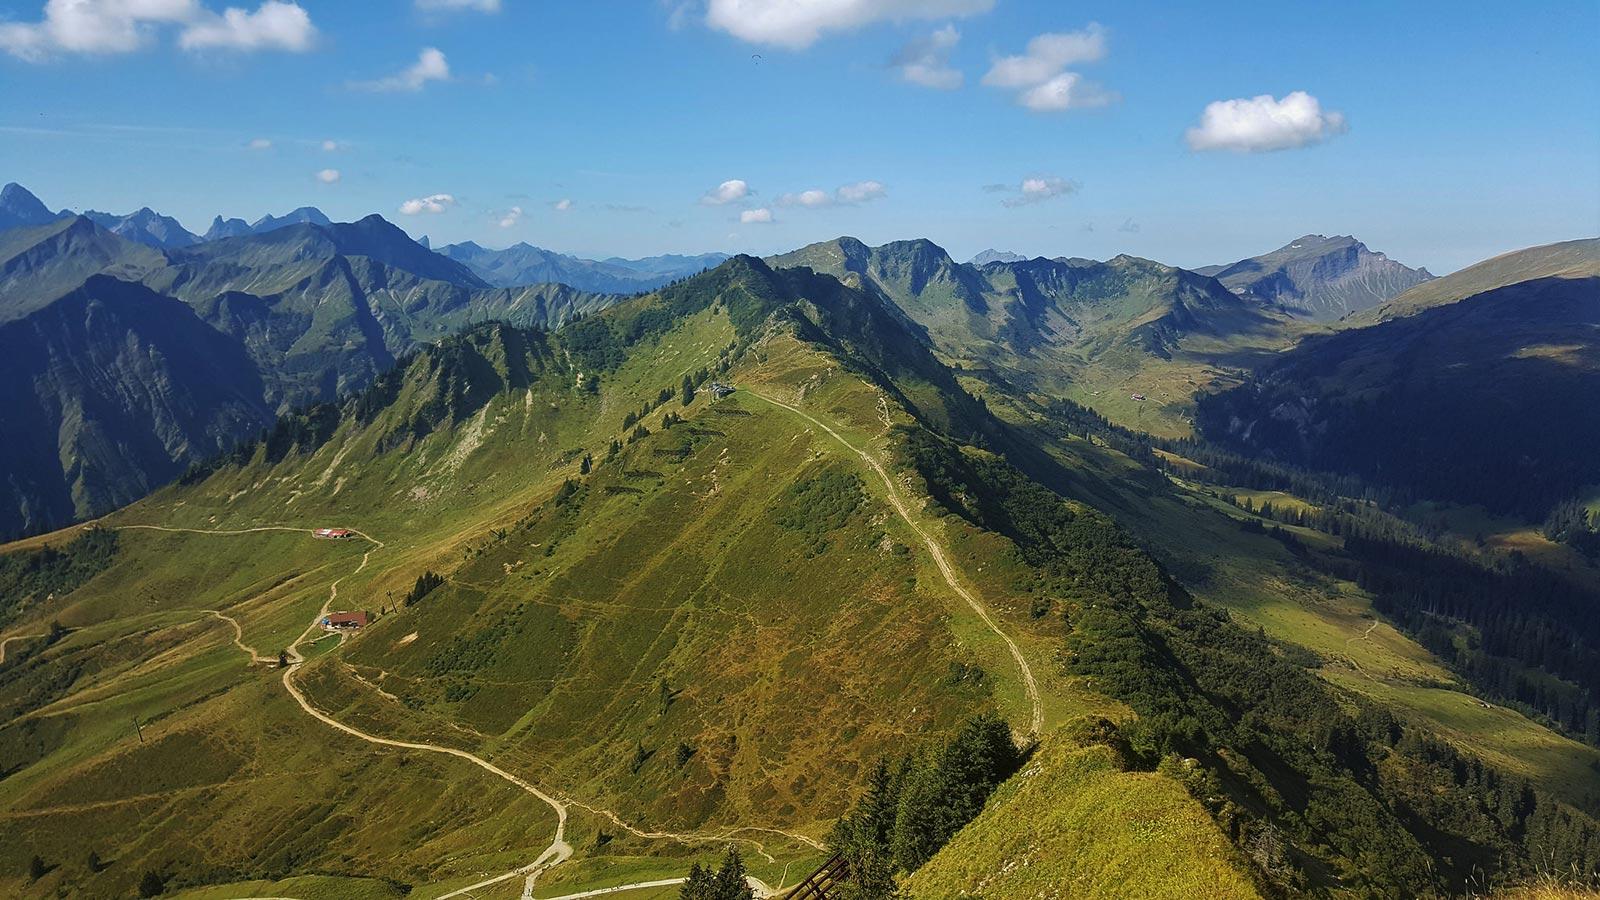 Panorama der Berglandschaft im Kleinwalsertal